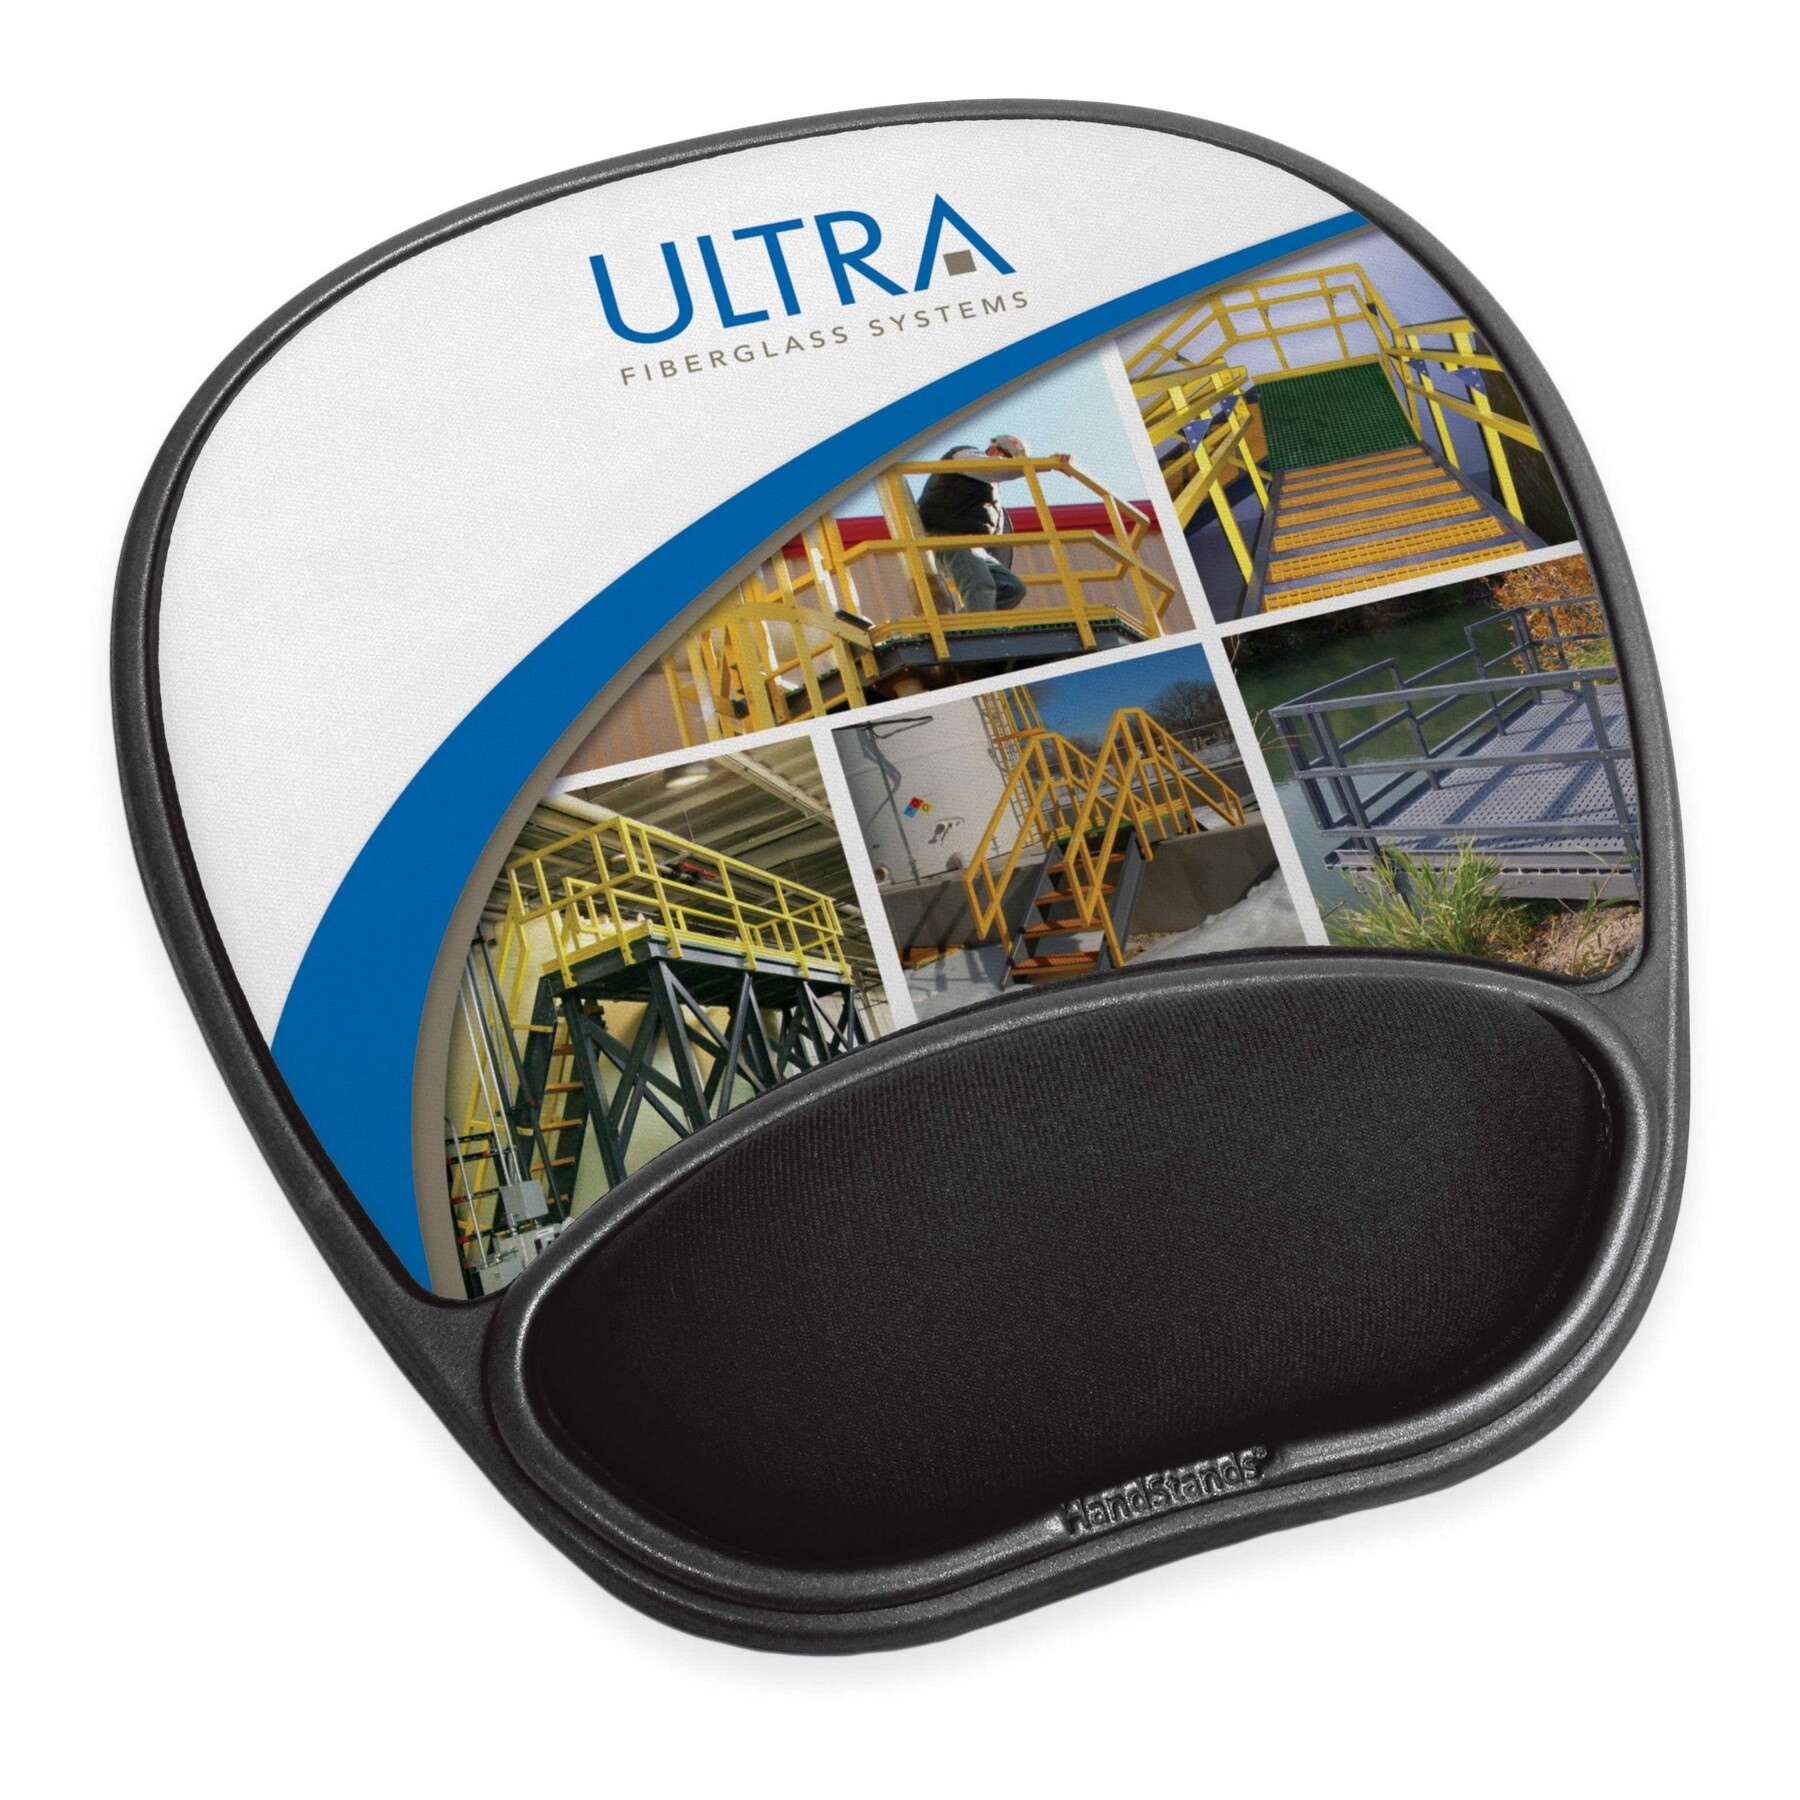 custom neoprene mouse pad